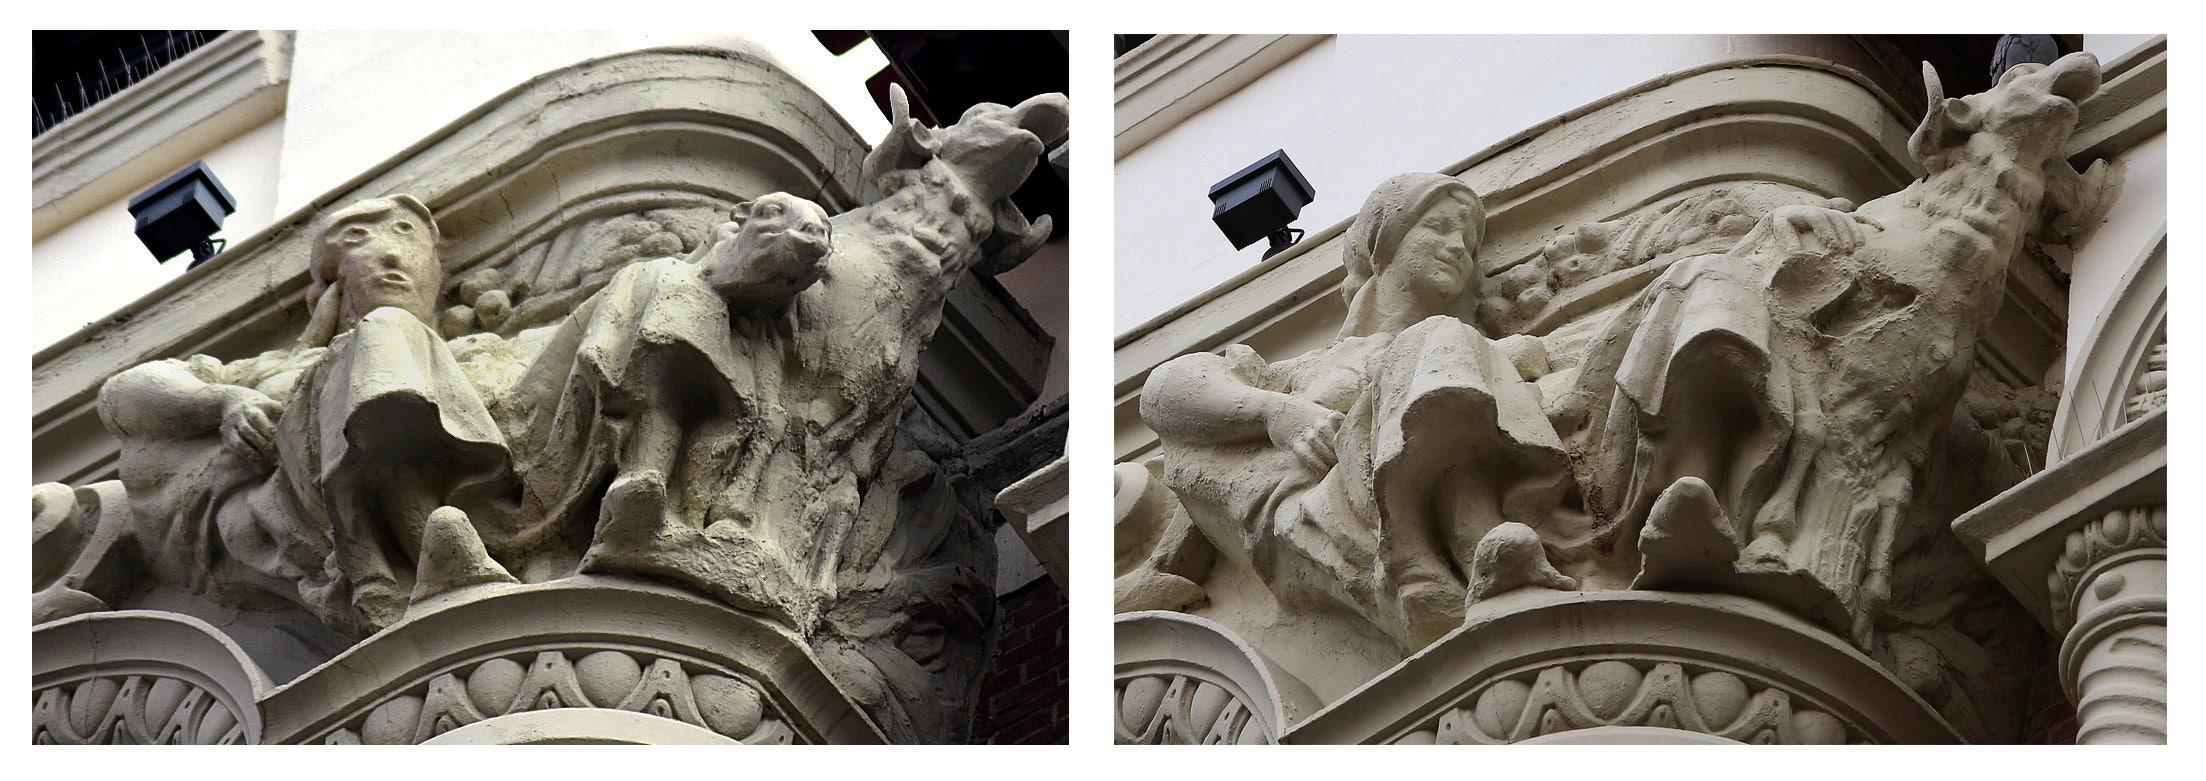 Botched Spanish sculpture restoration draws laughs criticism: 'The potato head of Palencia' – Fox News